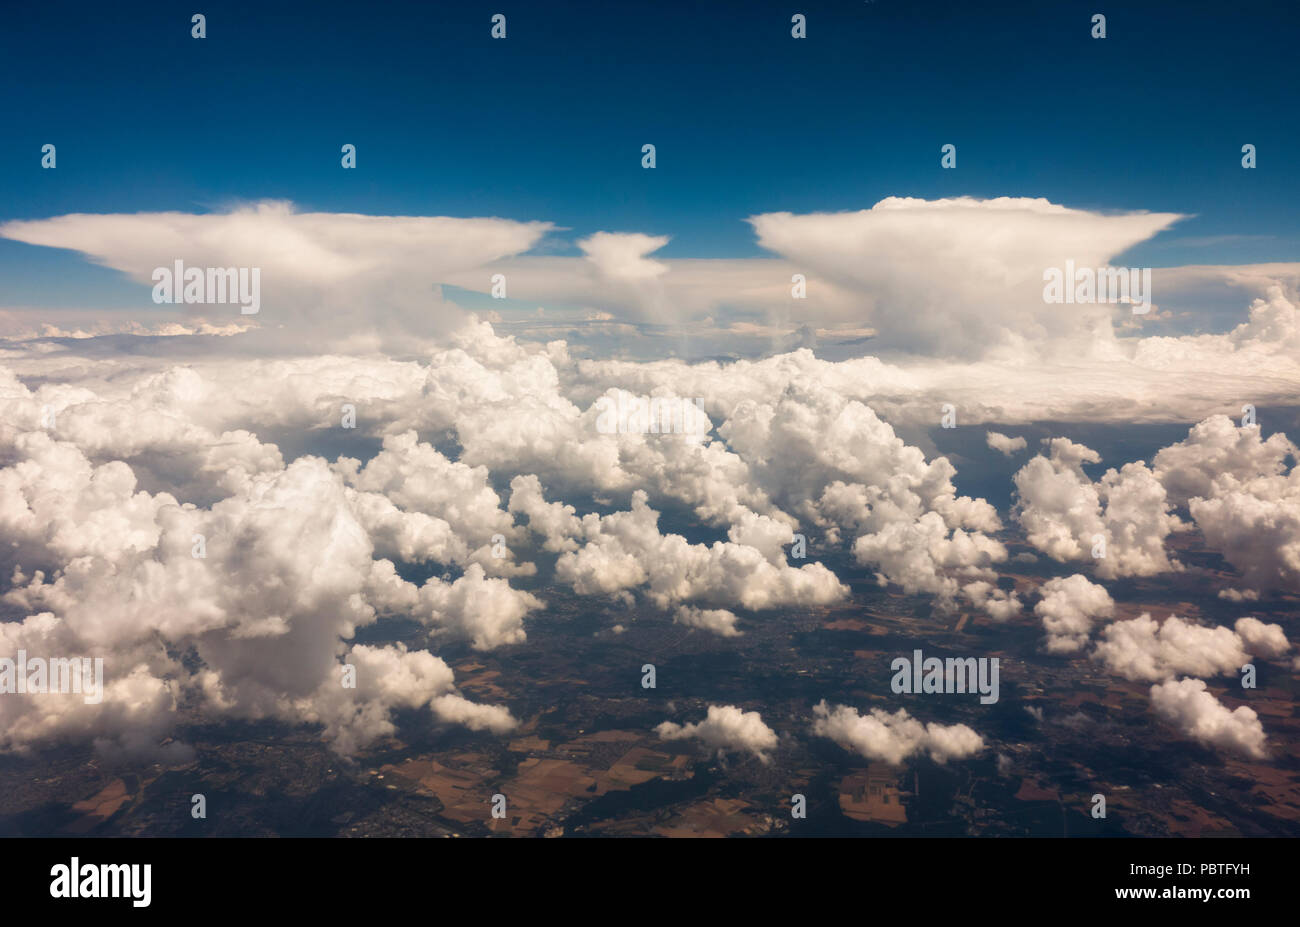 cloud types cumulus clouds and nimbostratus altostratus clouds